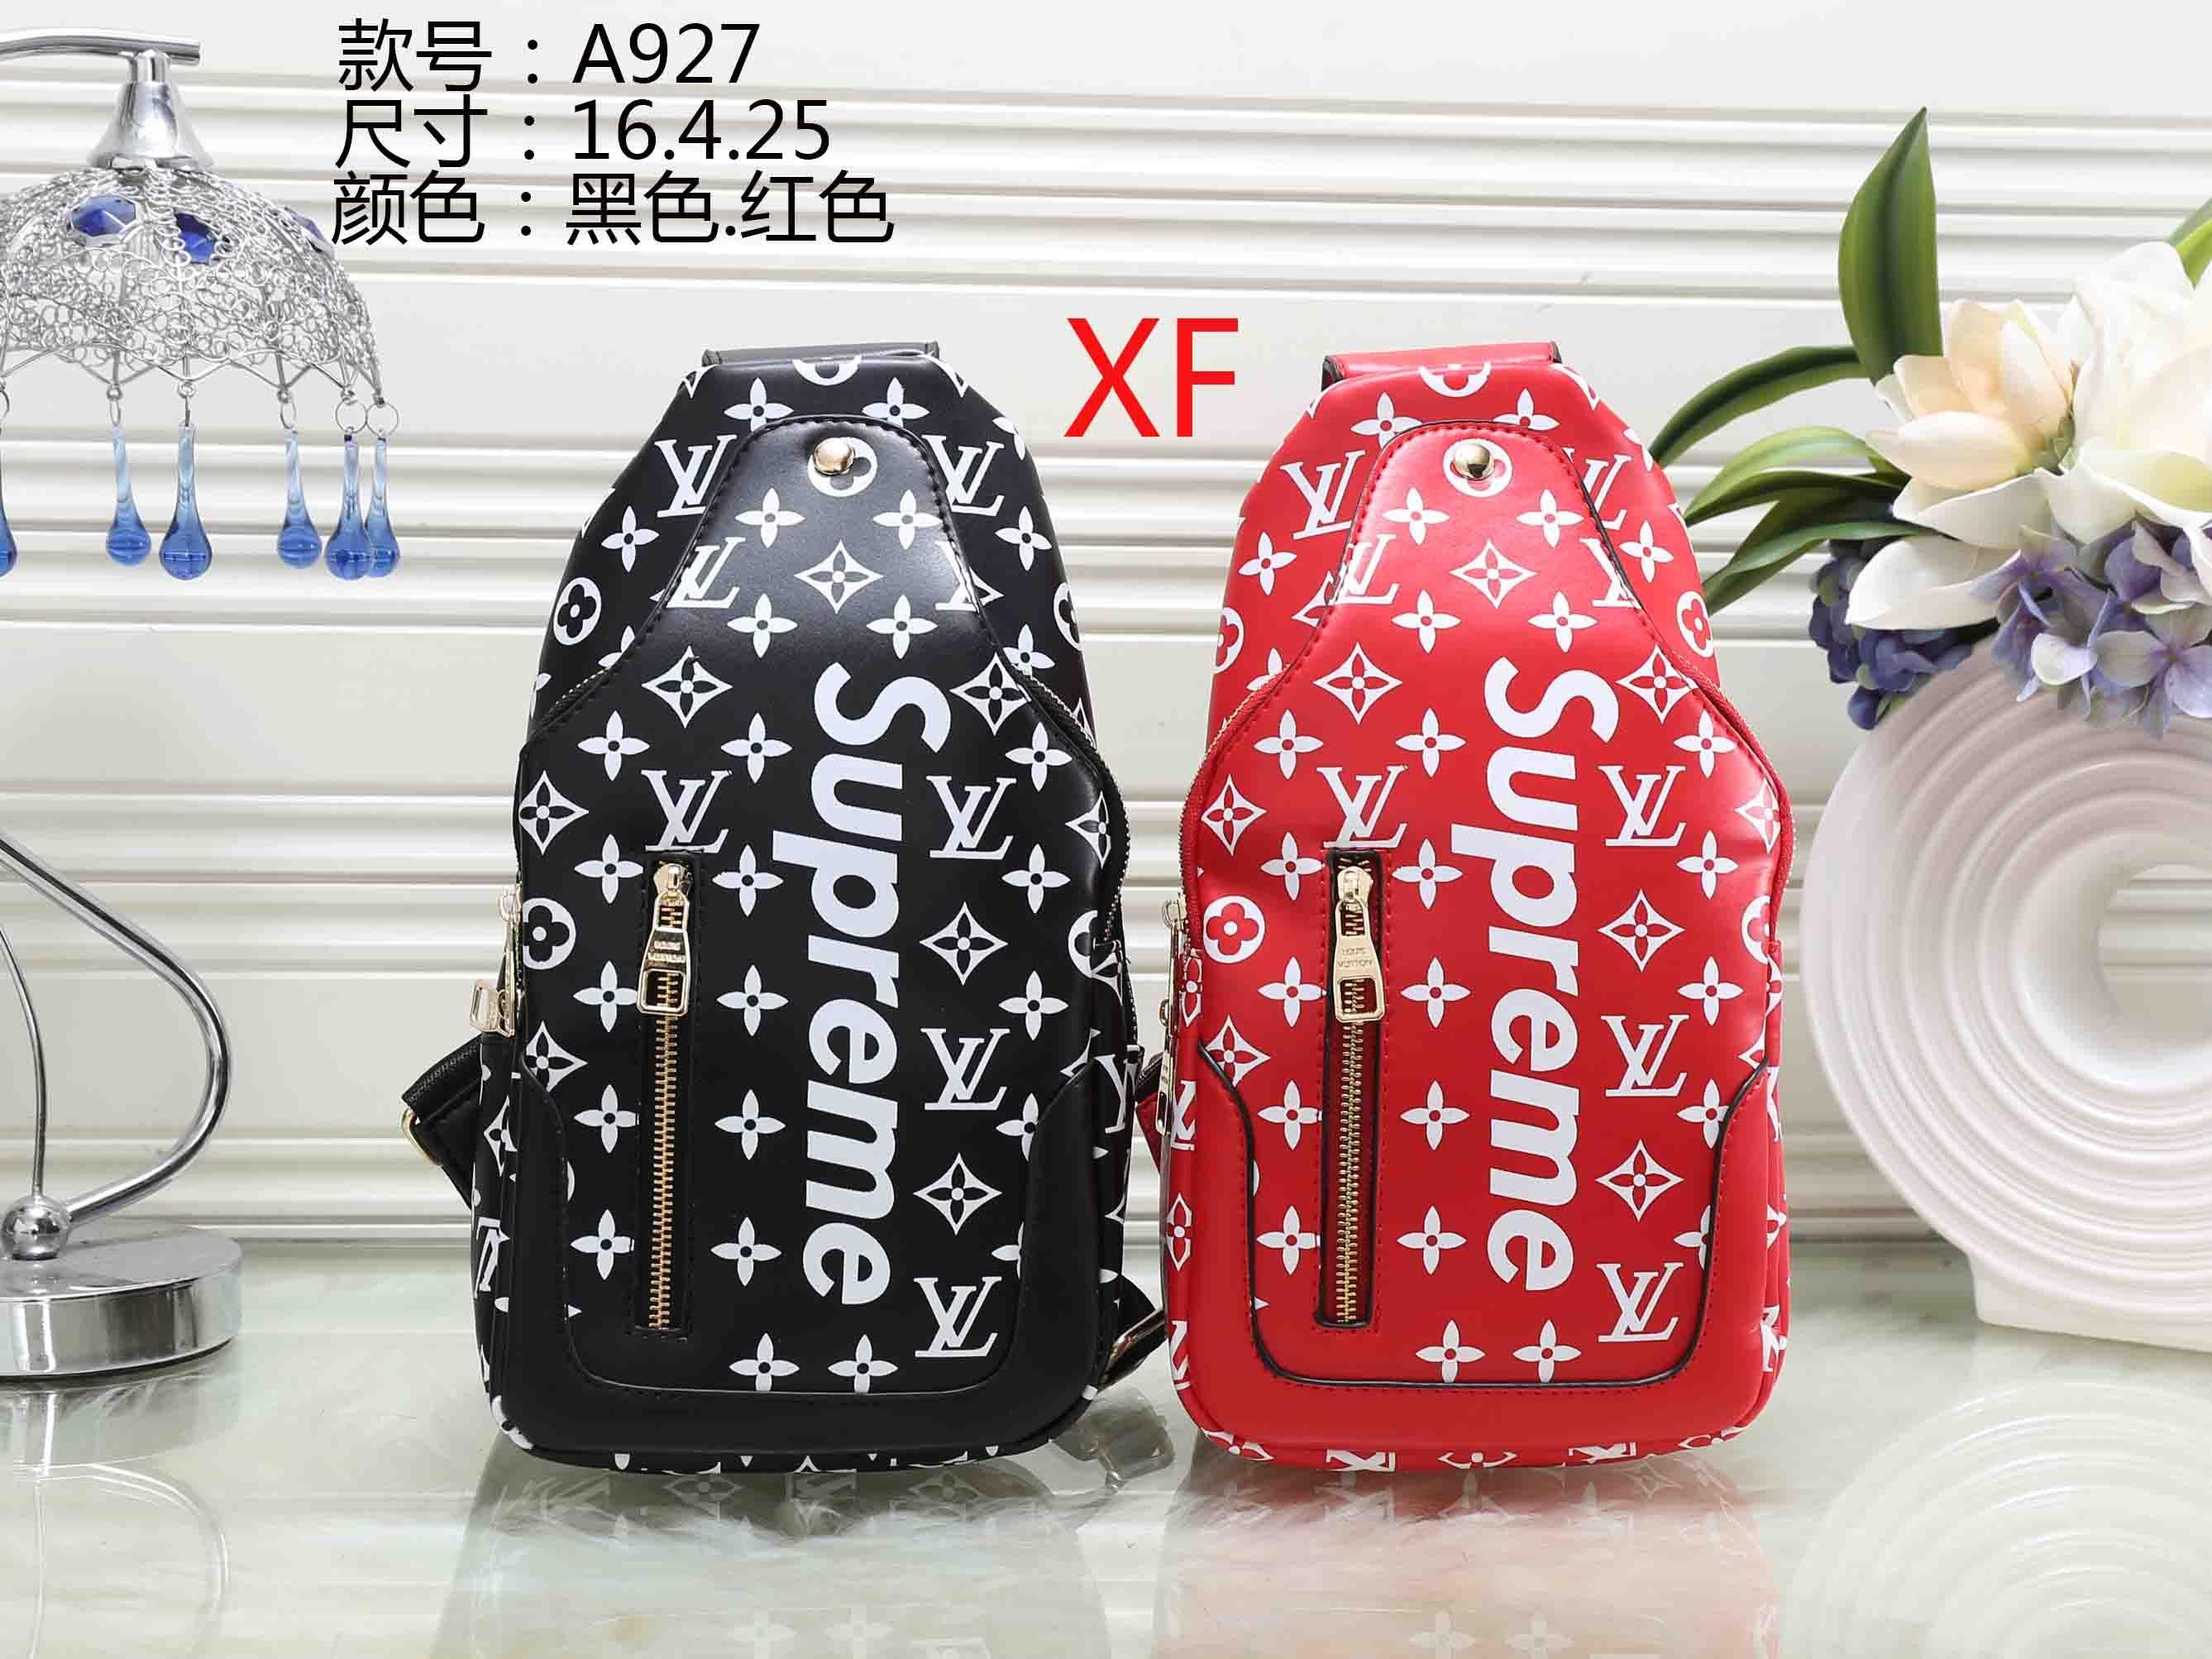 90c57b0c4d26 LOUISVUITTONFashion backpack Vintage Handbags Women bags Designer  Handbags Wallets for Women Leather Chain Bag Crossbody and Shoulder #01